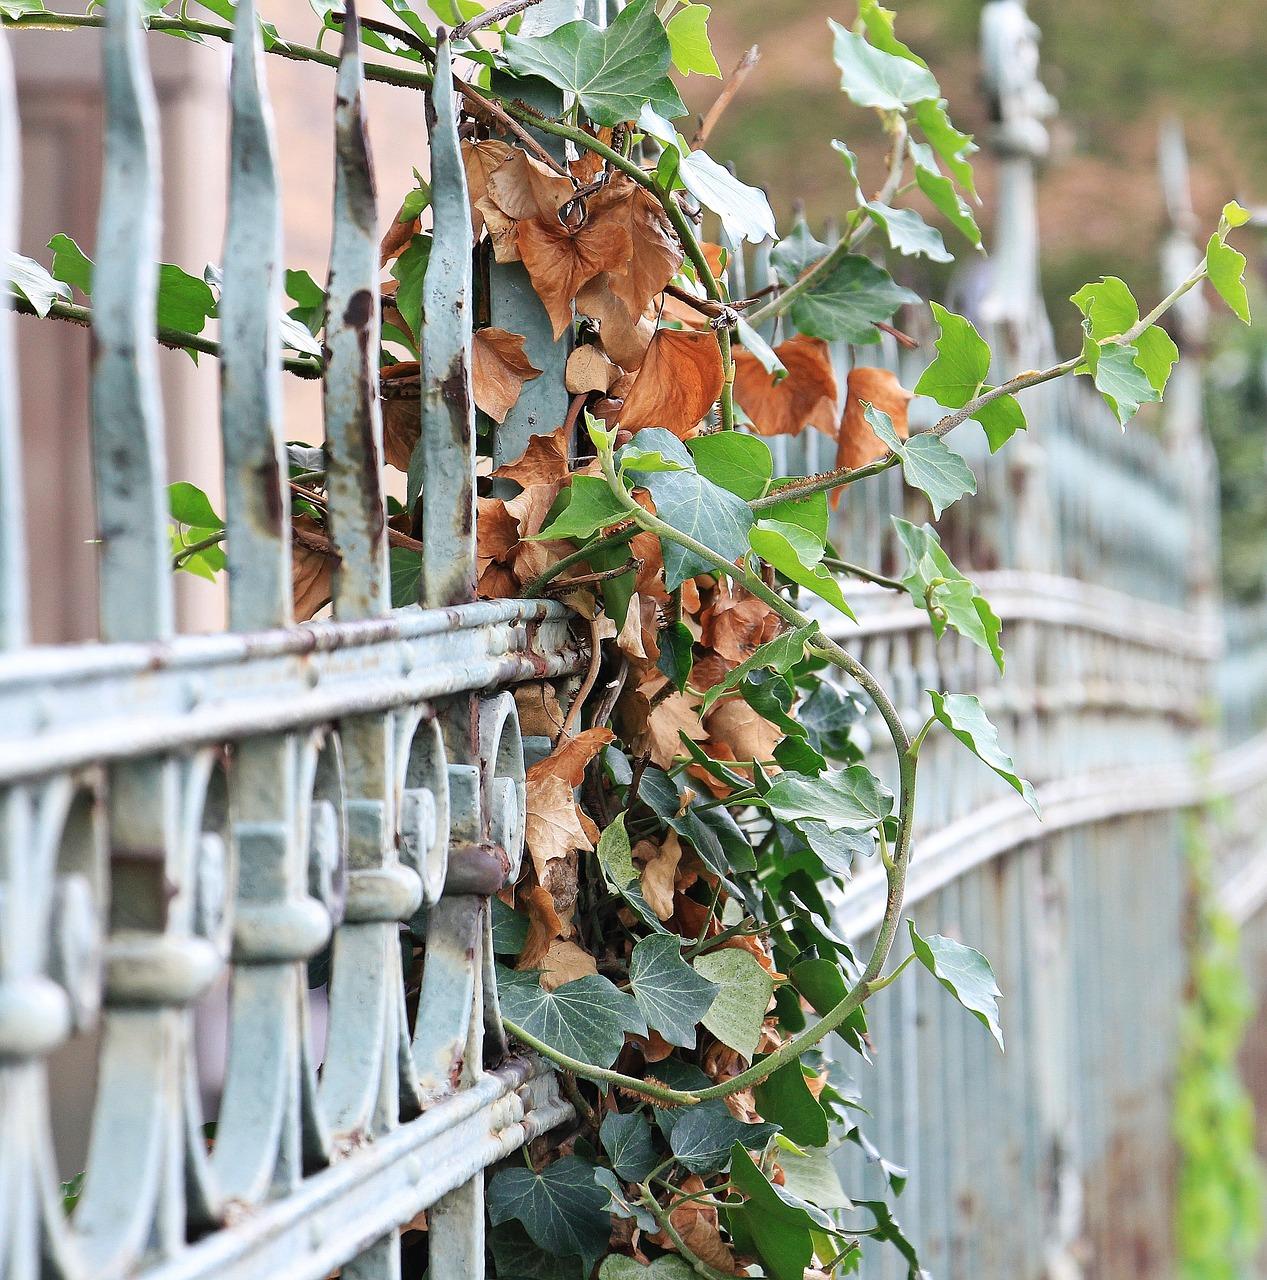 fence-1543108_1280.jpg